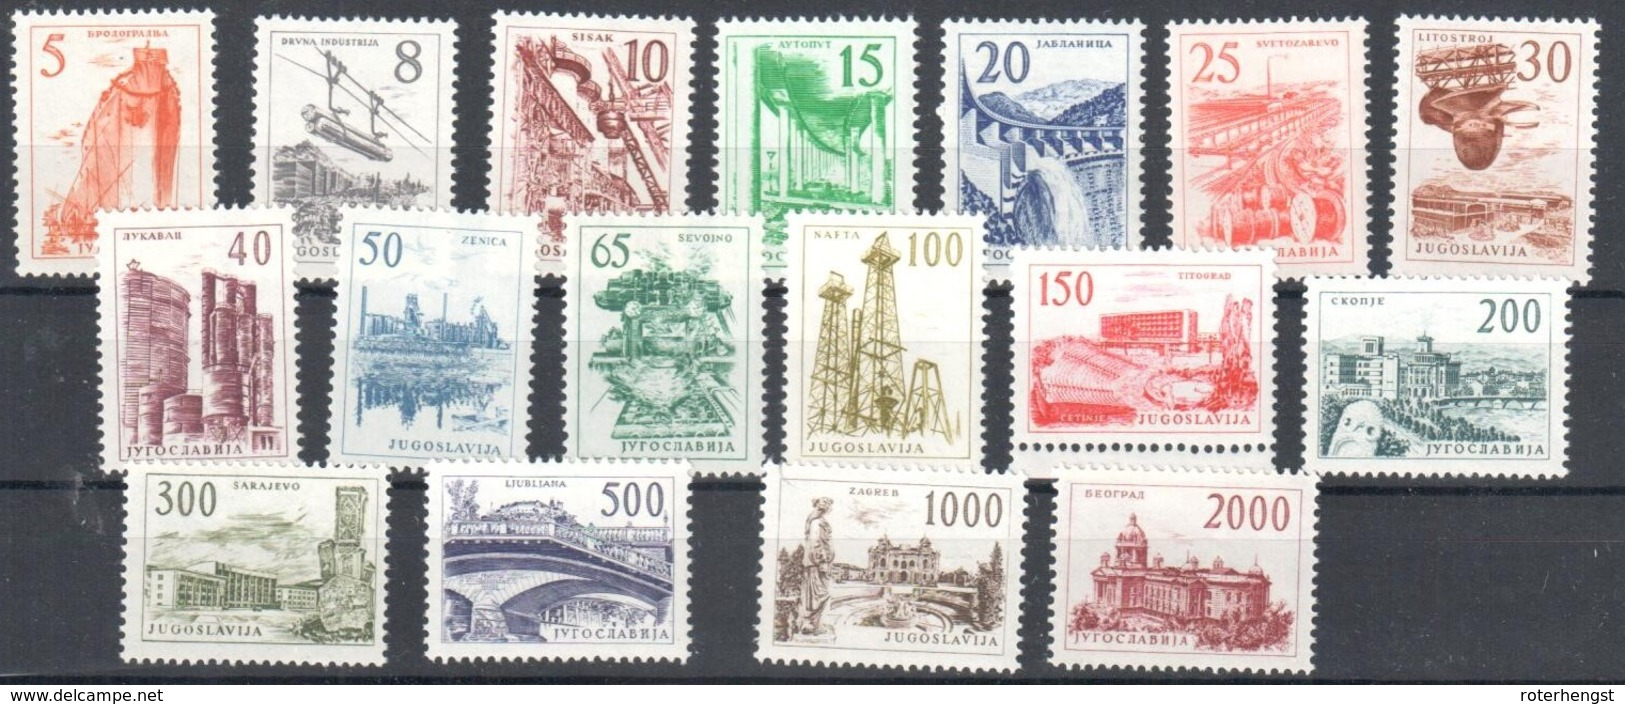 1961 Yougoslavia Complete Set Mnh ** 40 Euros - 1945-1992 Sozialistische Föderative Republik Jugoslawien